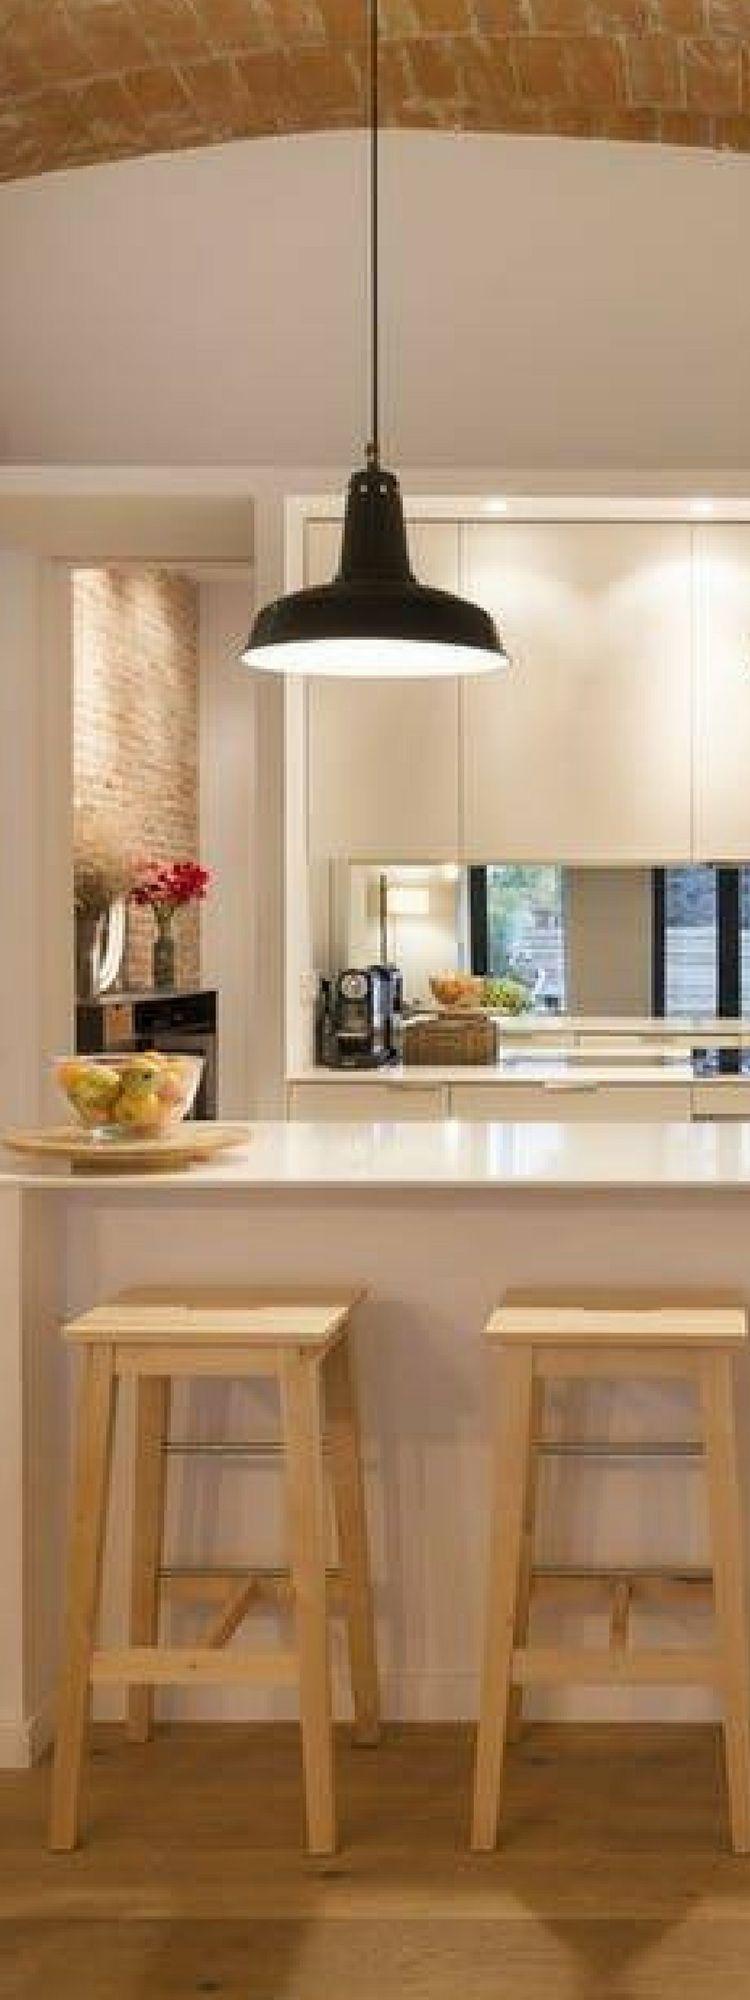 Magnífico Centros De Diseño De Cocina En Danbury Ct Adorno - Como ...